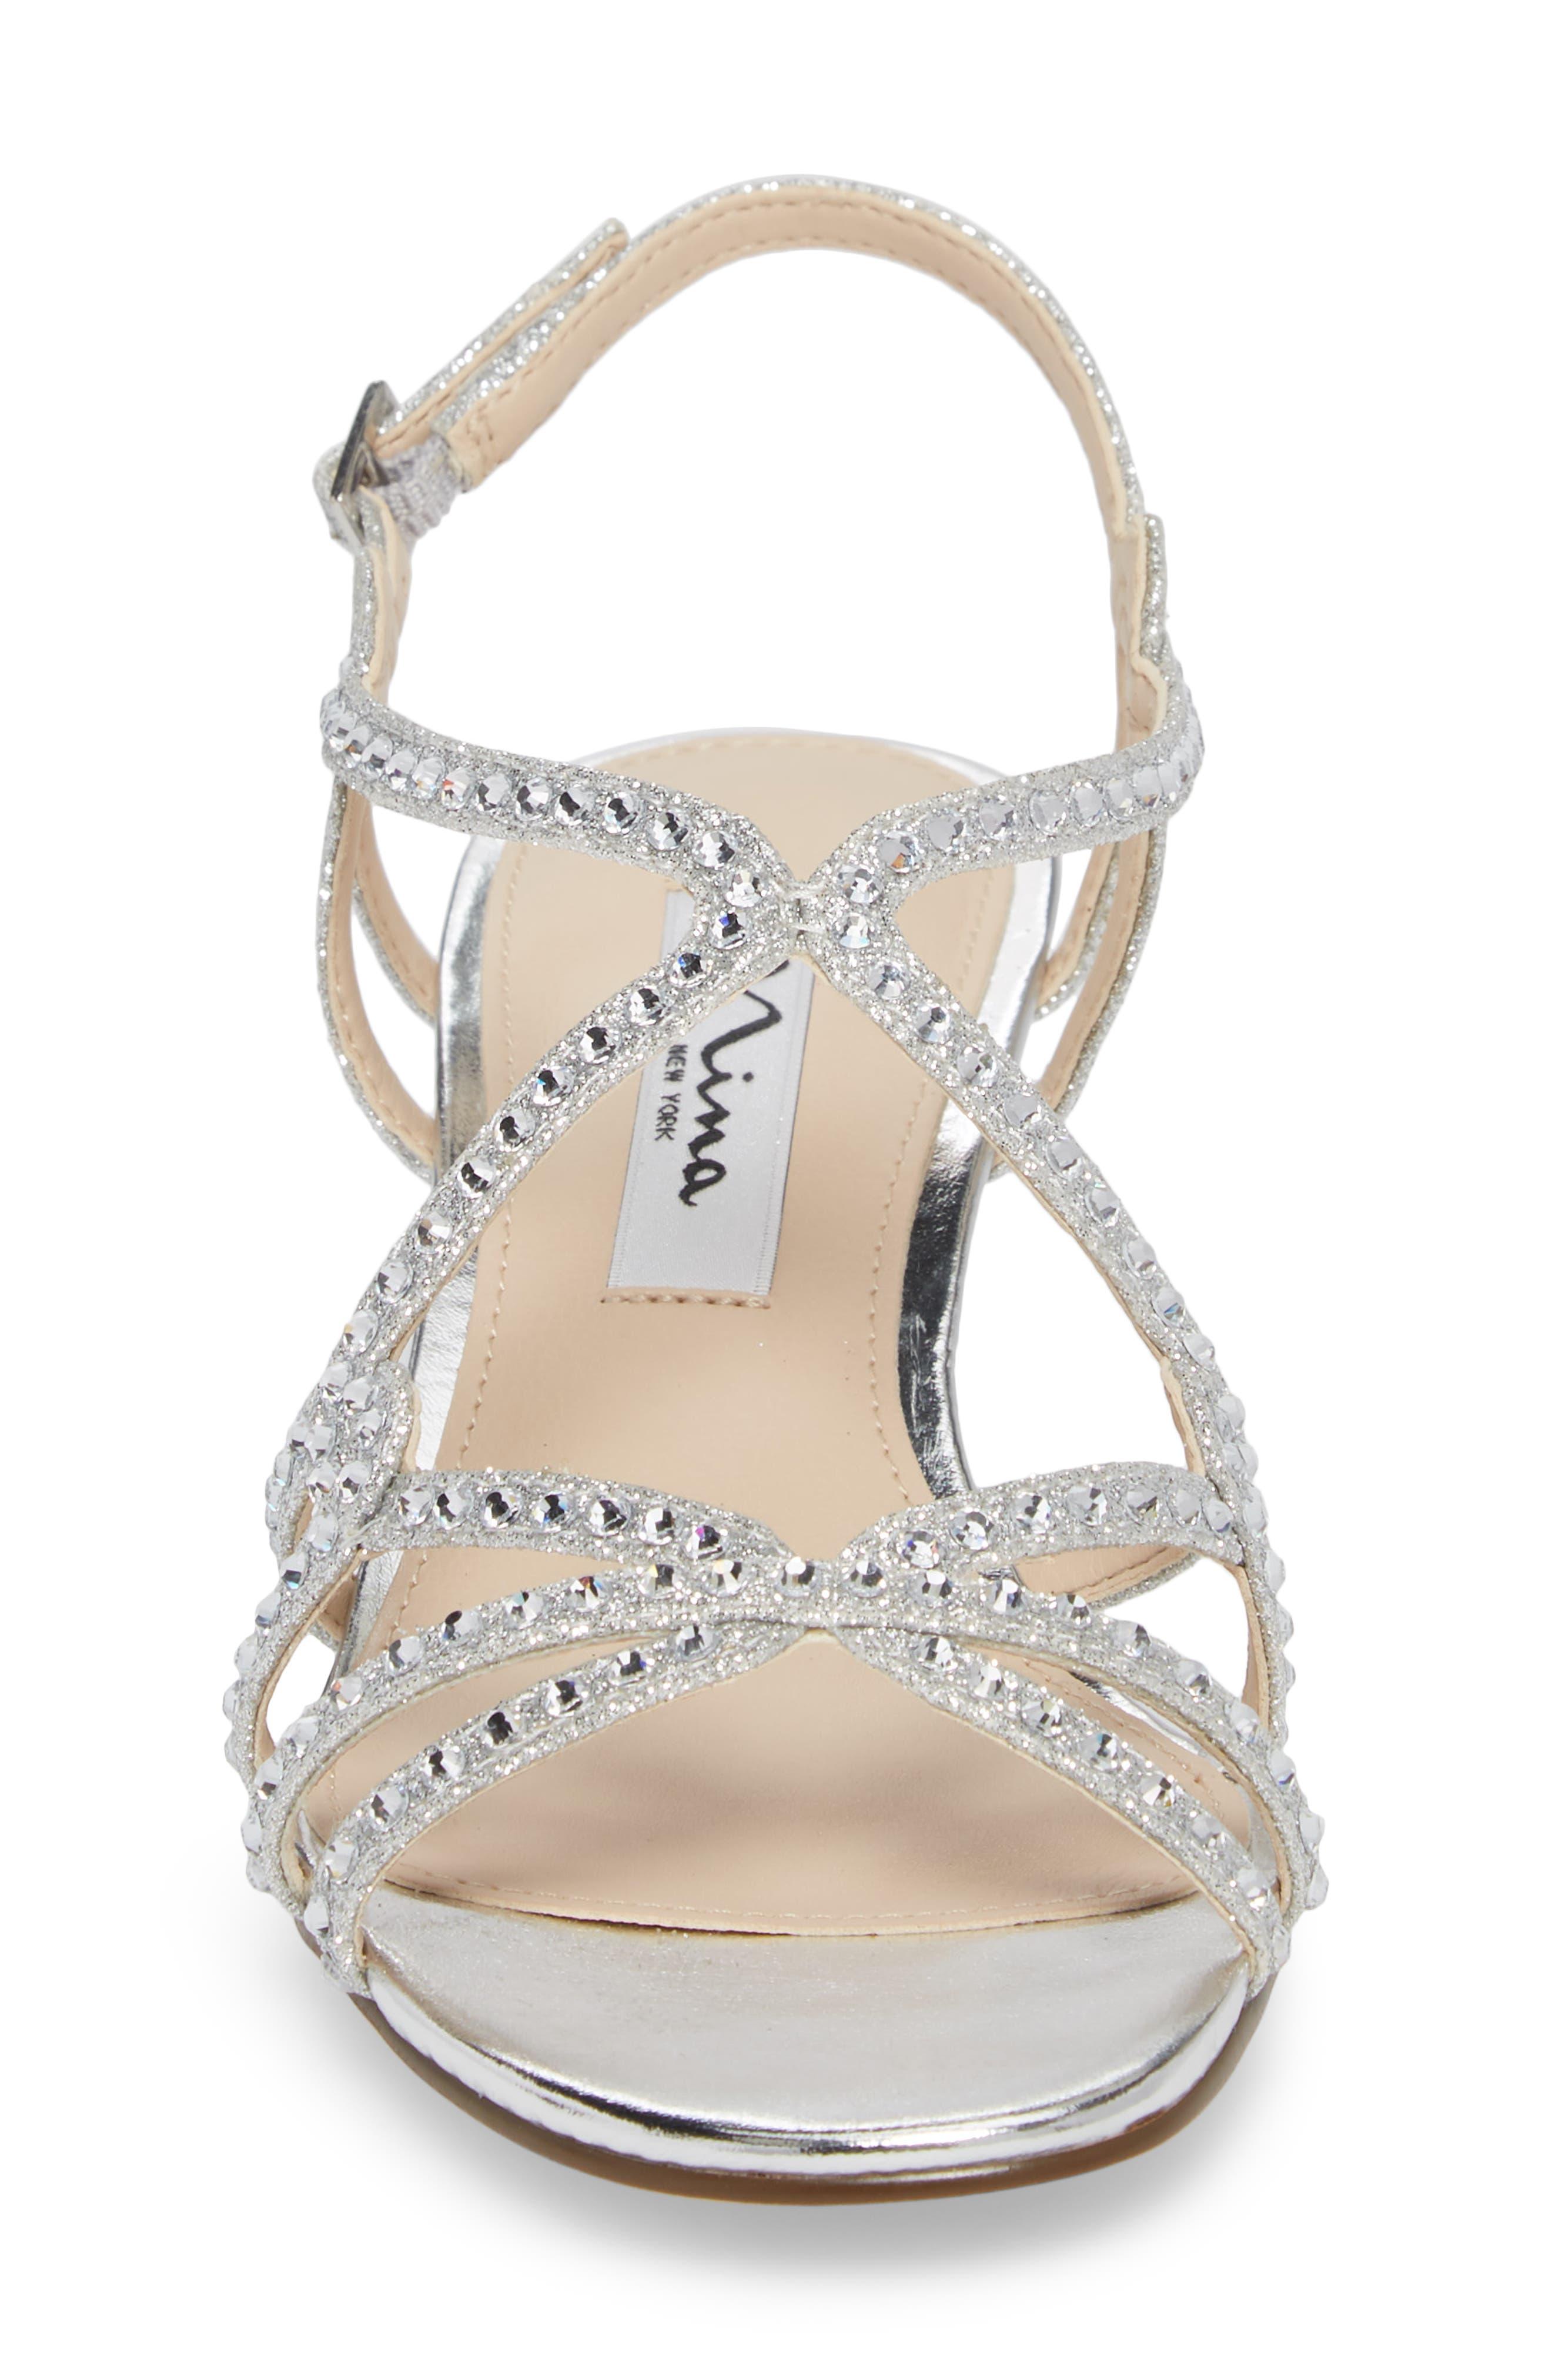 Finola Sandal,                             Alternate thumbnail 4, color,                             Silver Glitter Fabric